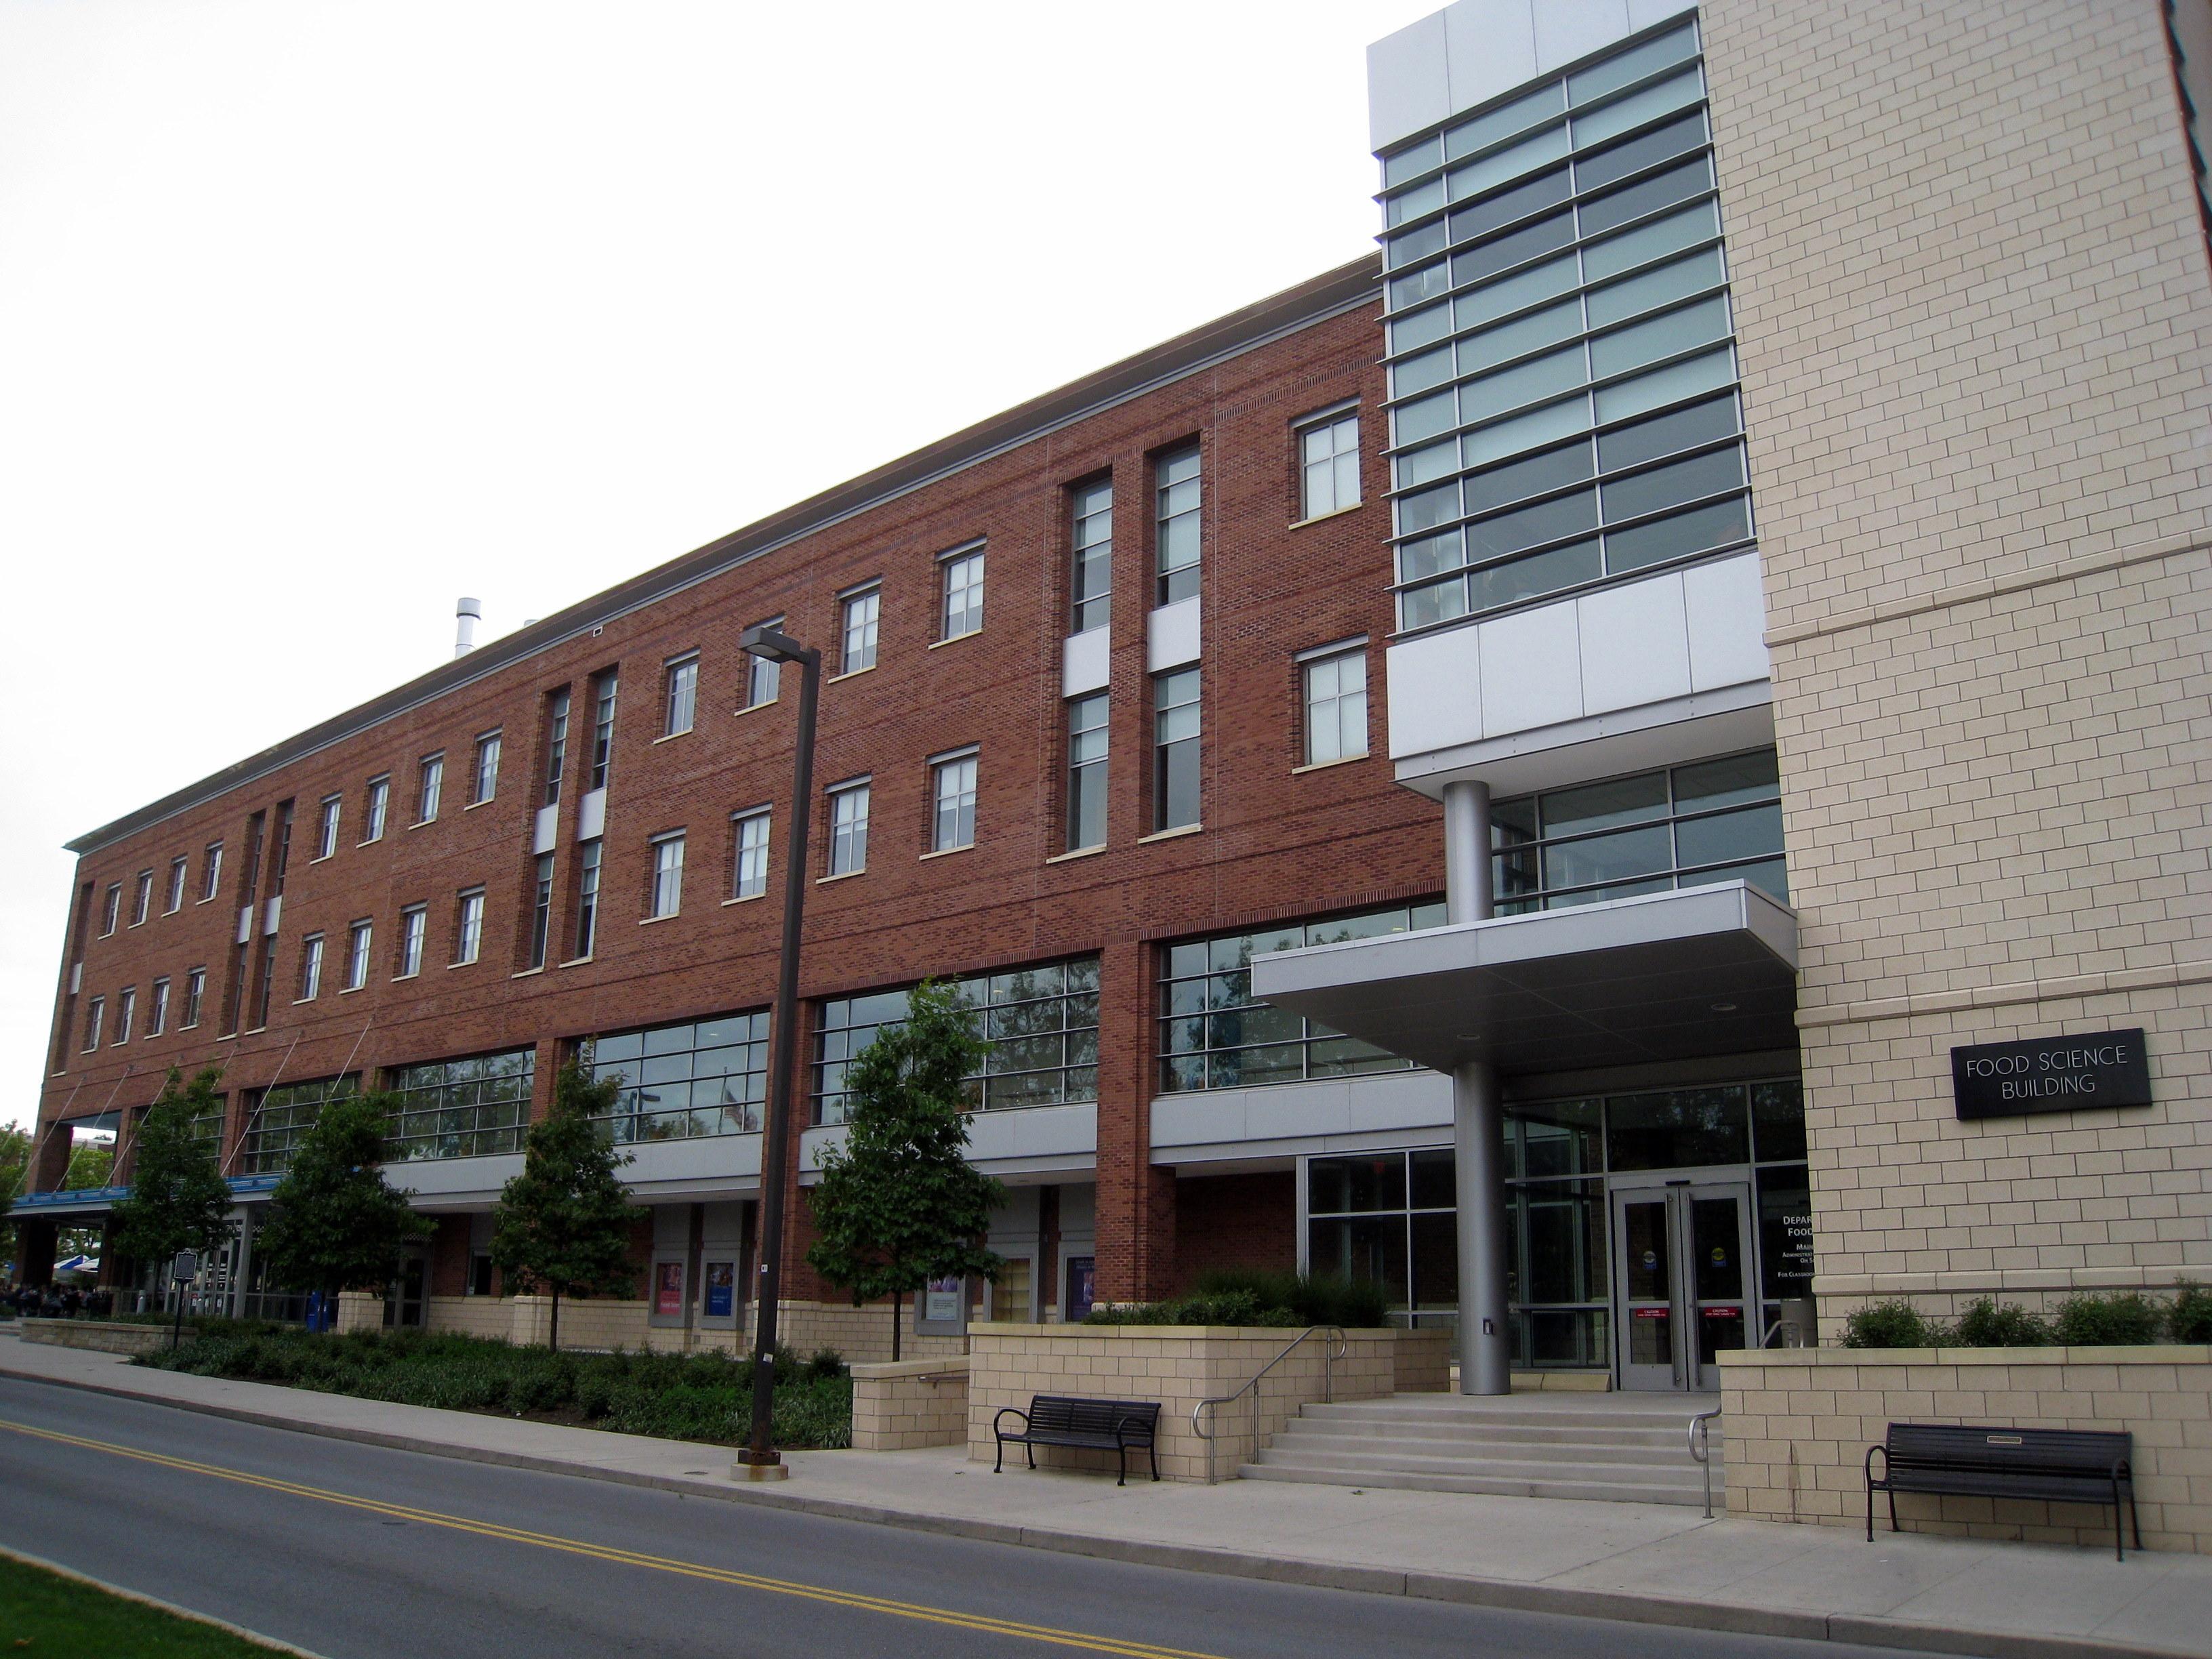 dissertations pennsylvania state university